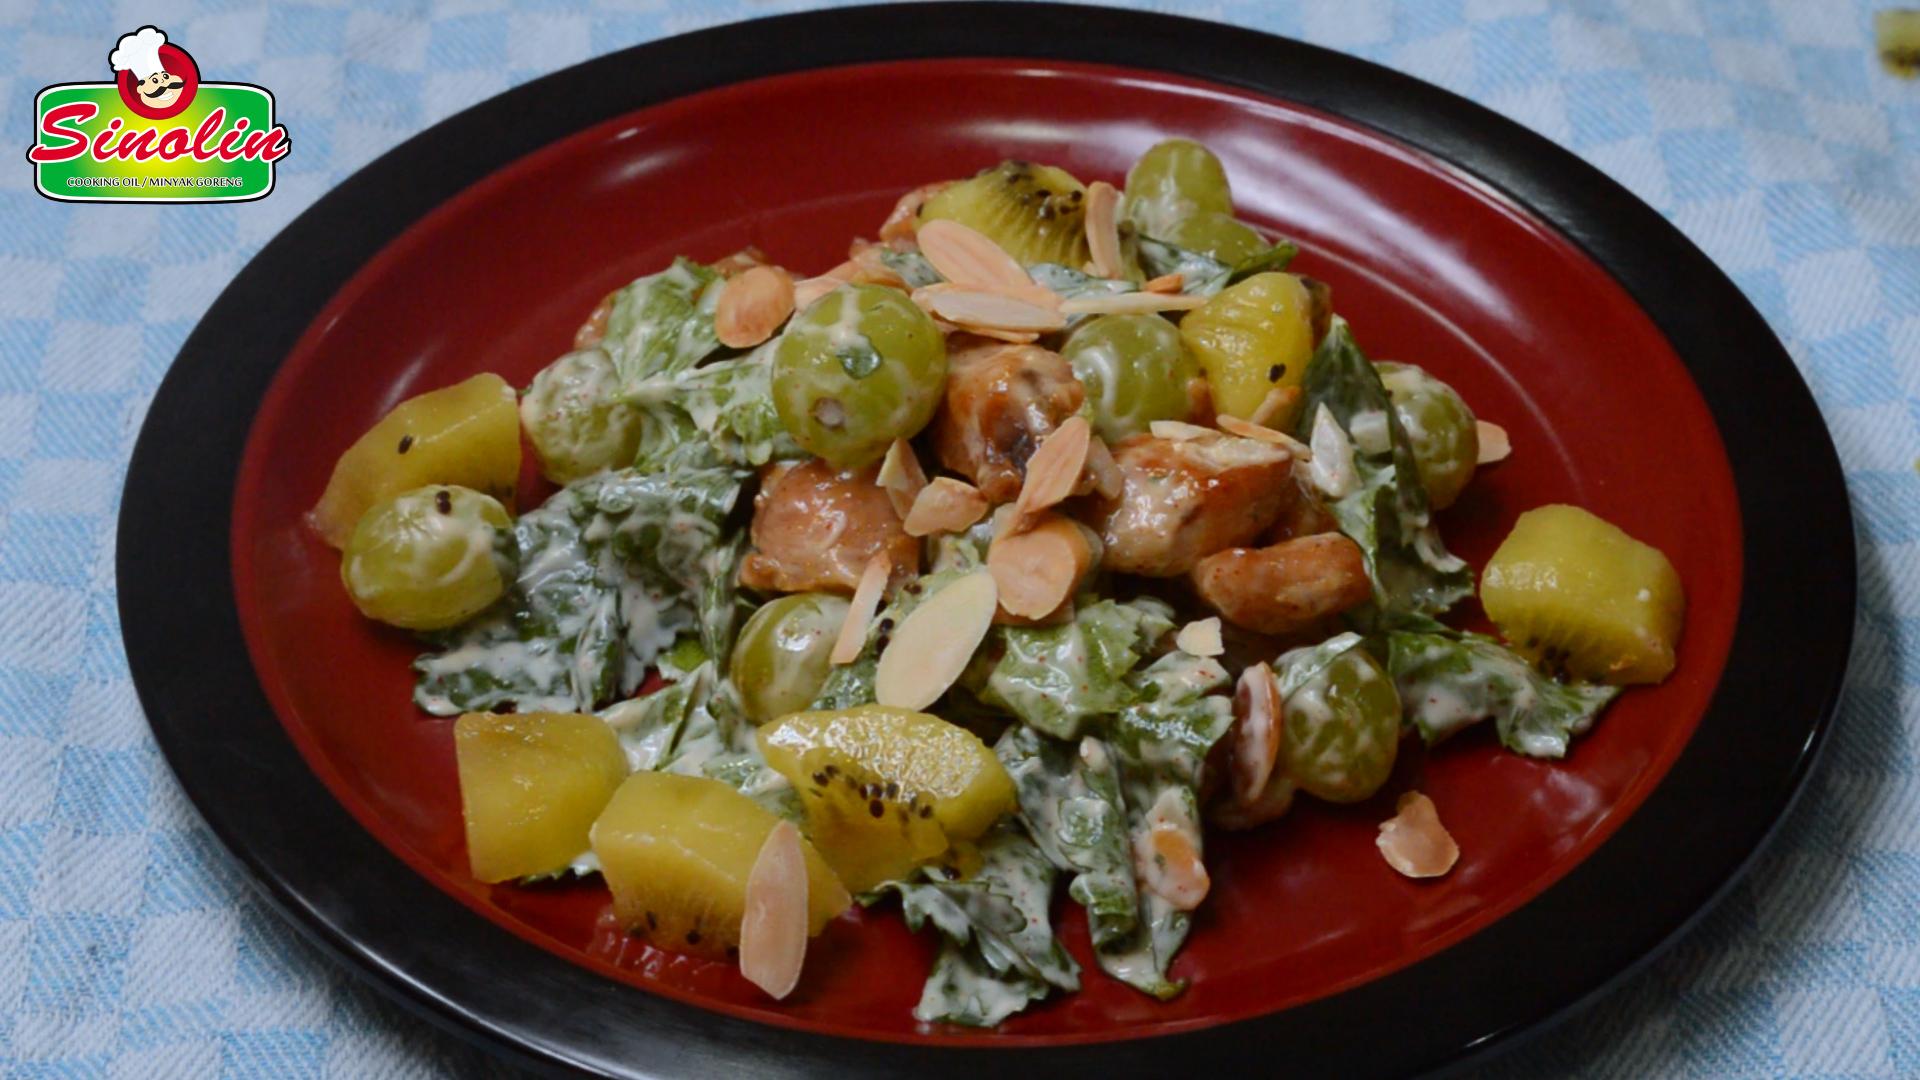 Resep Salad Ayam Almon Oleh Dapur Sinolin